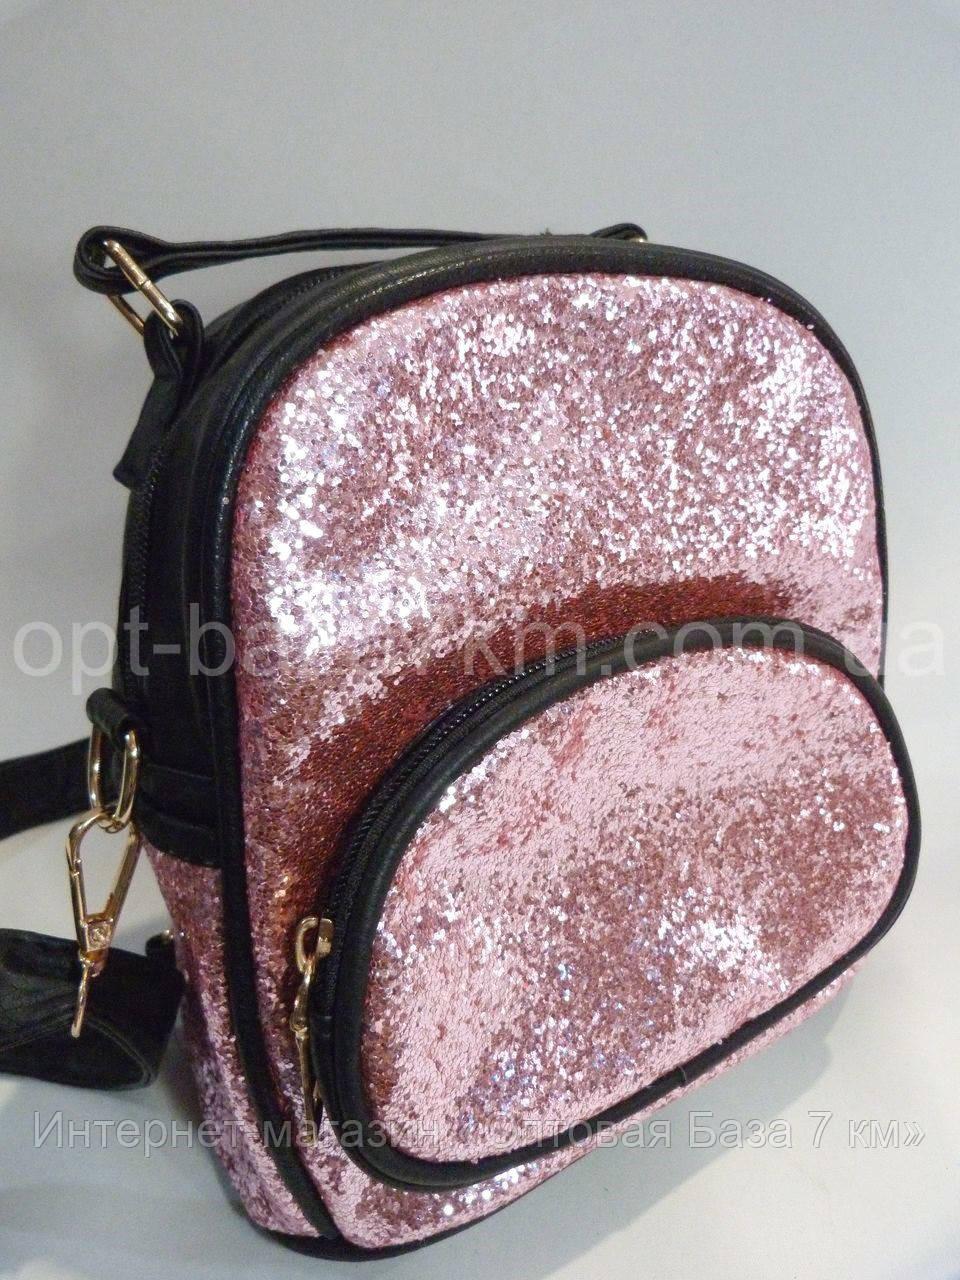 72e01966d388 Женский рюкзак-сумка